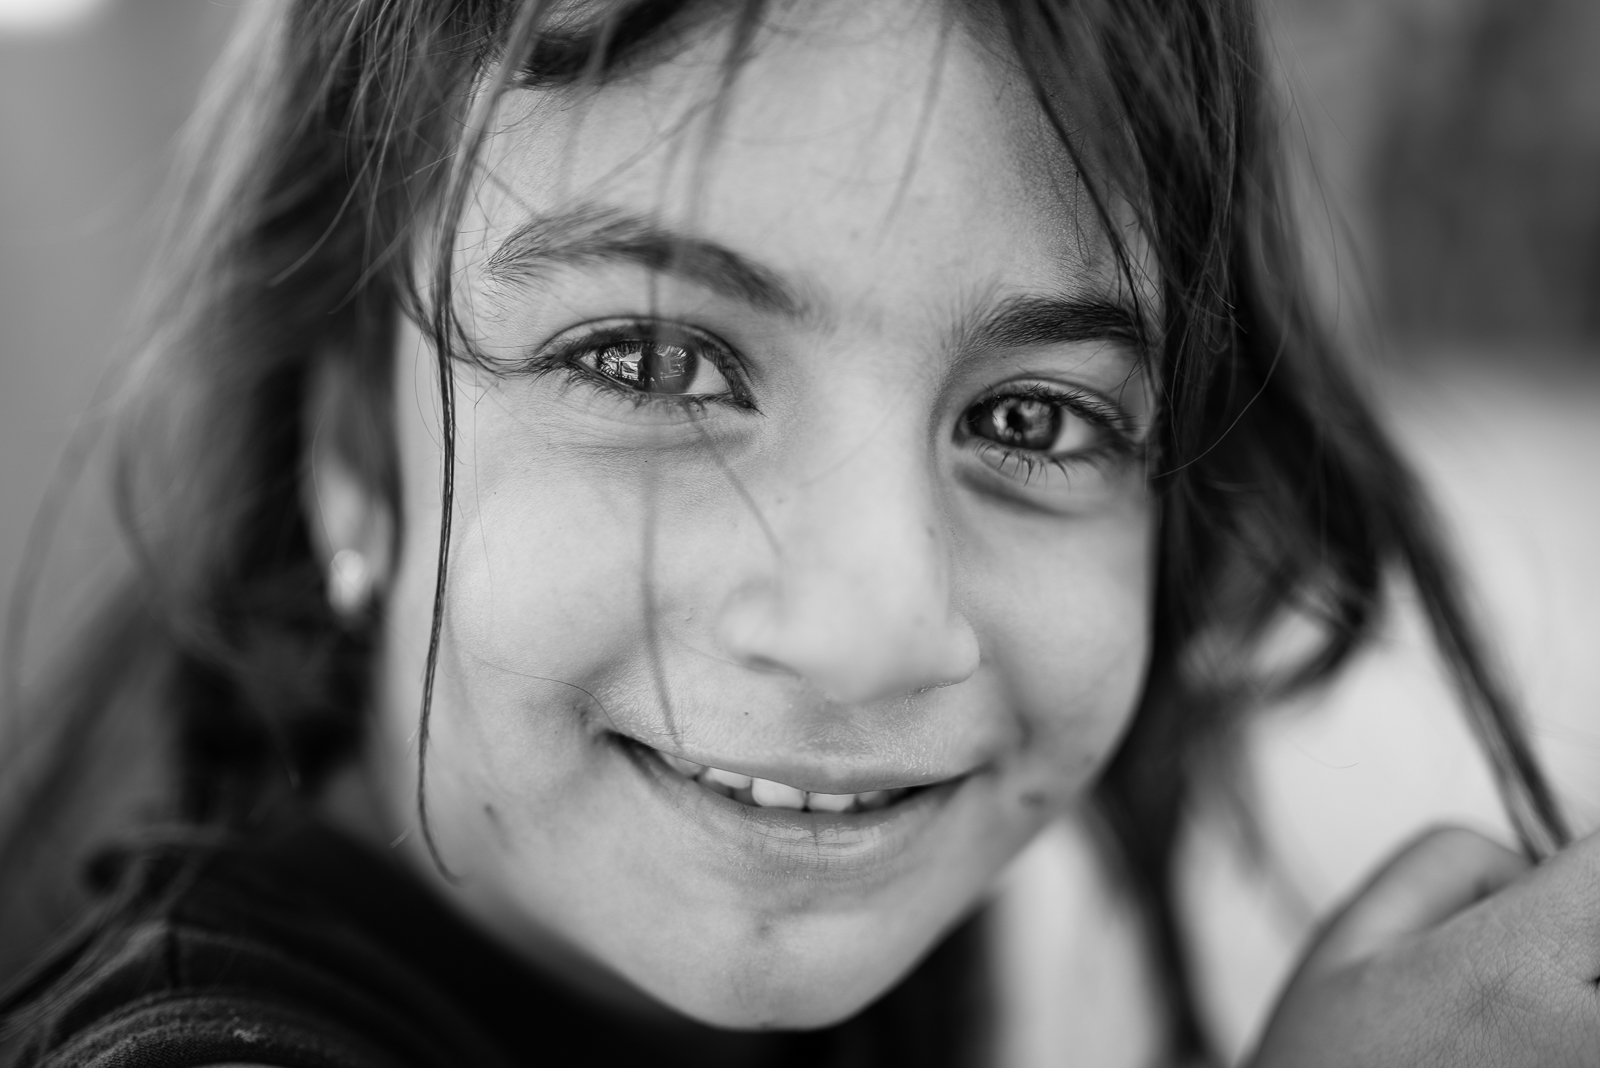 Little girl in a christians camp in Erbil